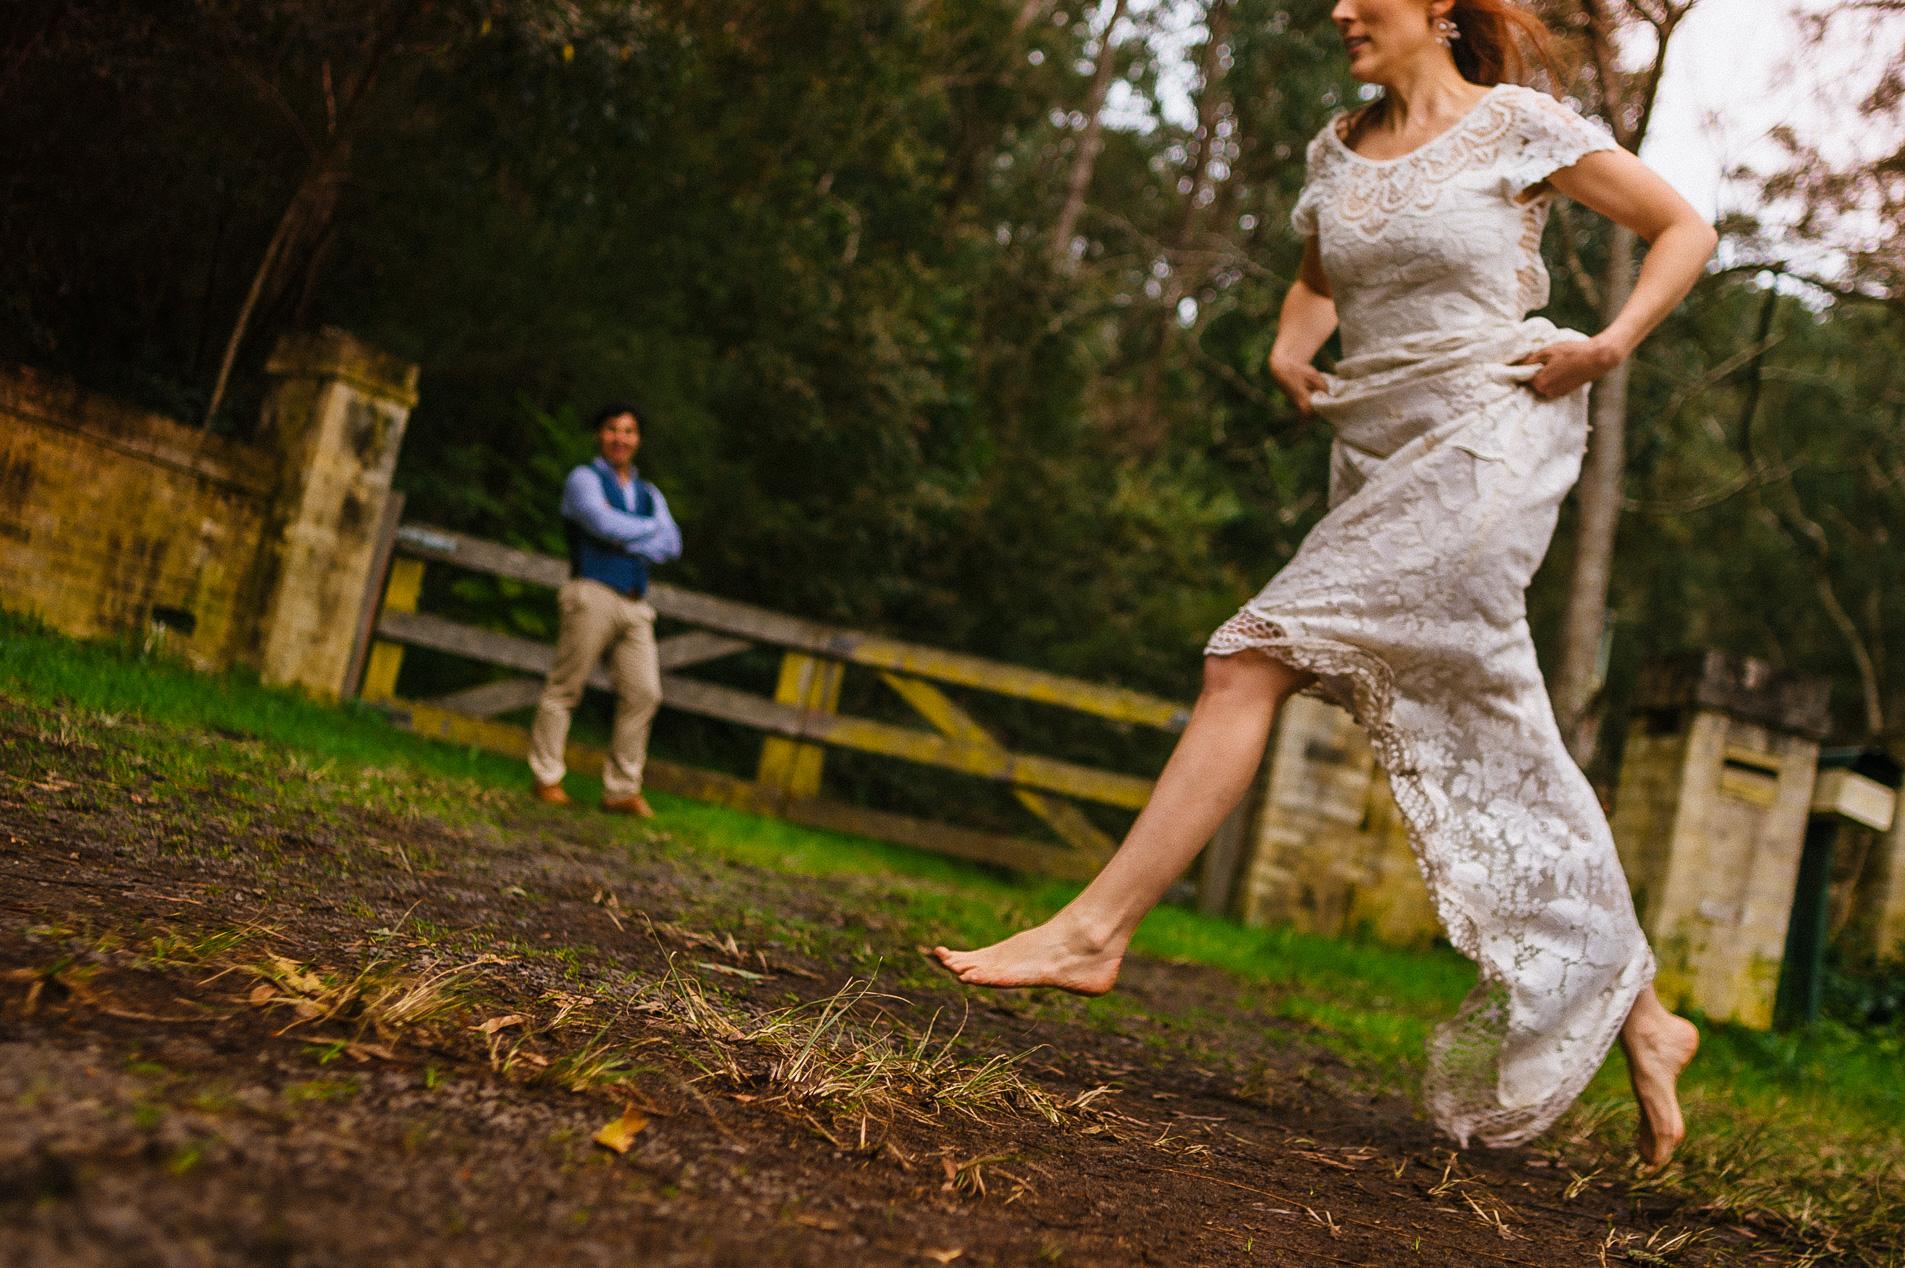 Rachel-gonzalo-wedding-sydney-12